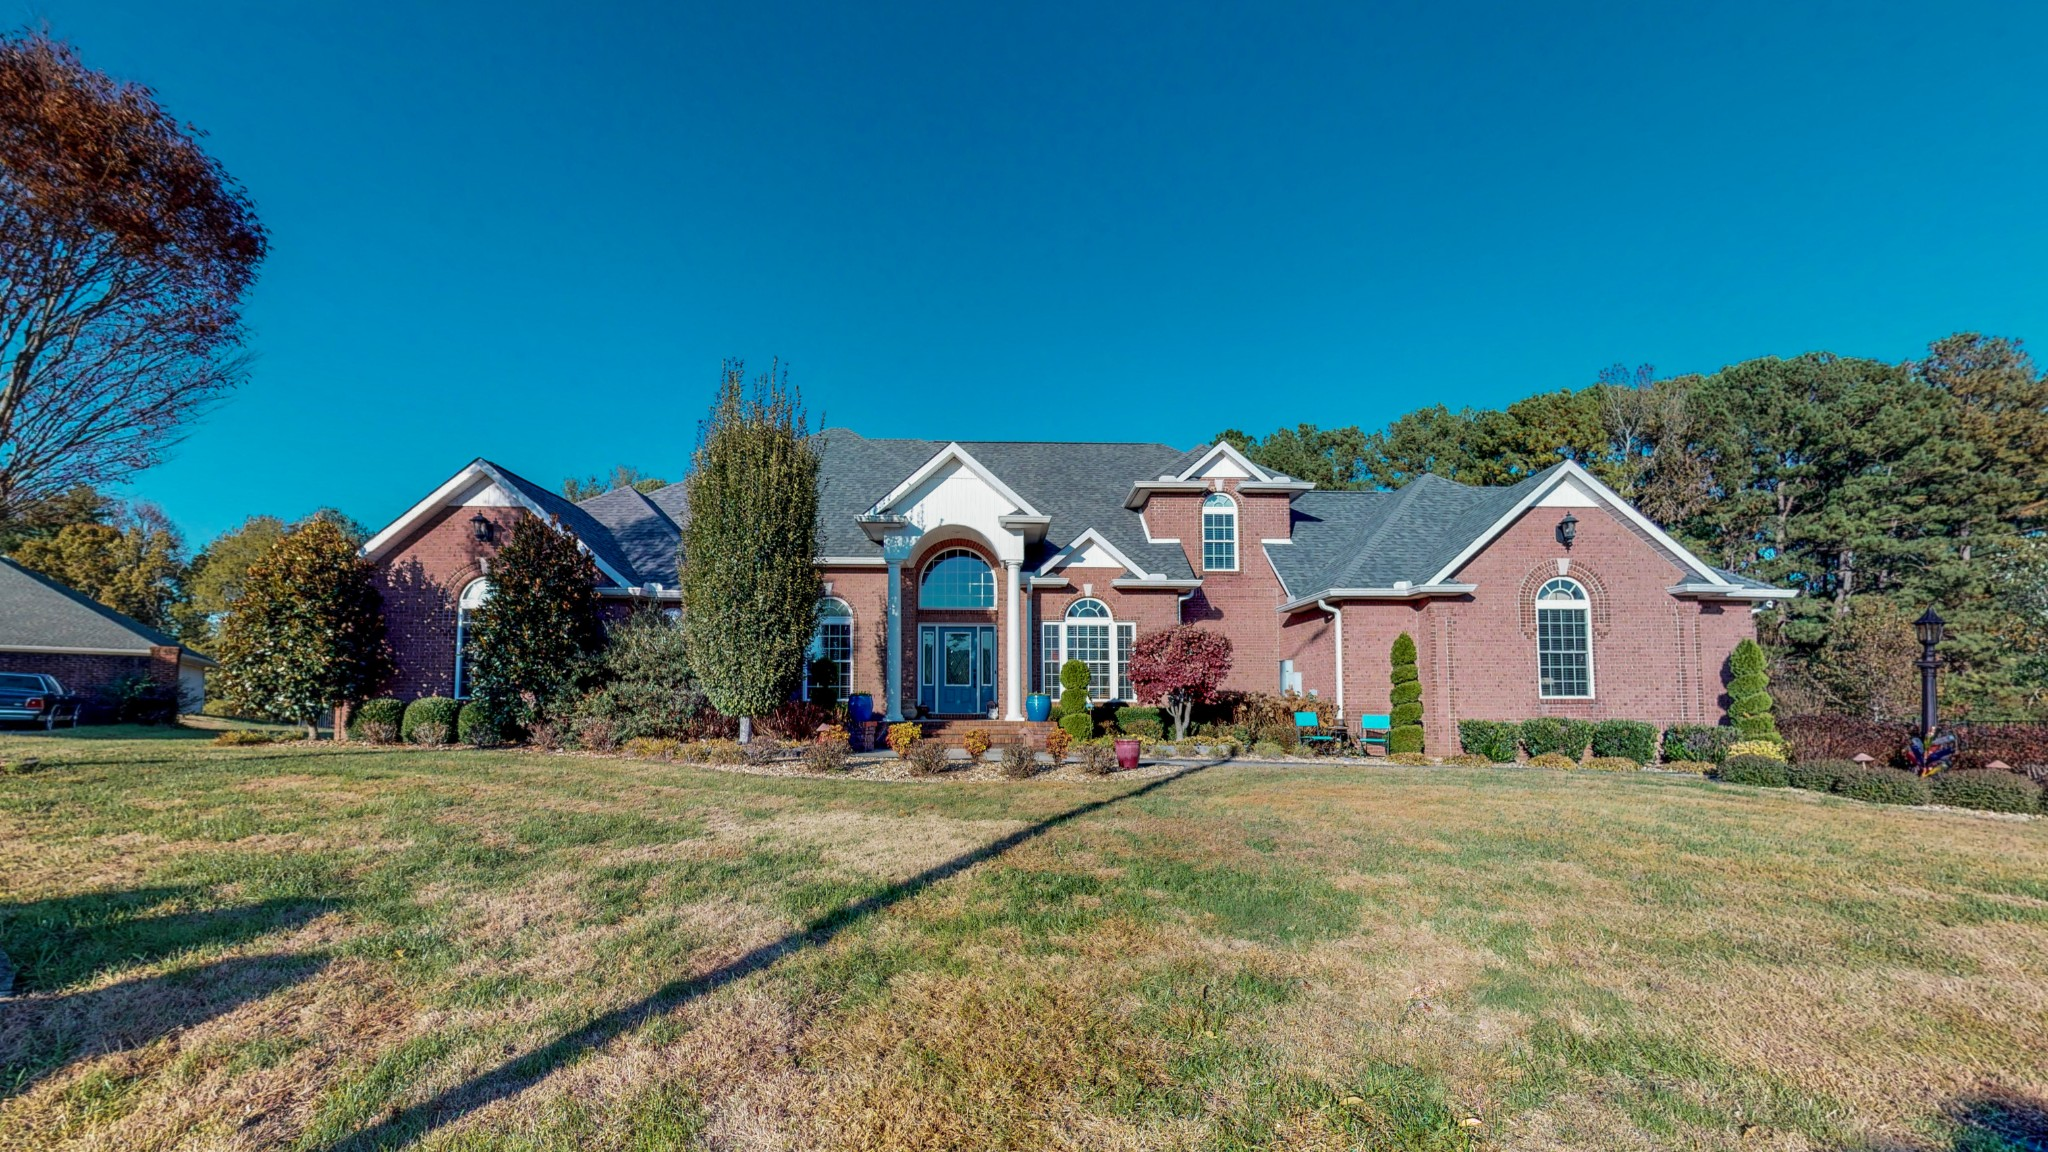 104 WILLIAMS CT., Tullahoma, TN 37388 - Tullahoma, TN real estate listing